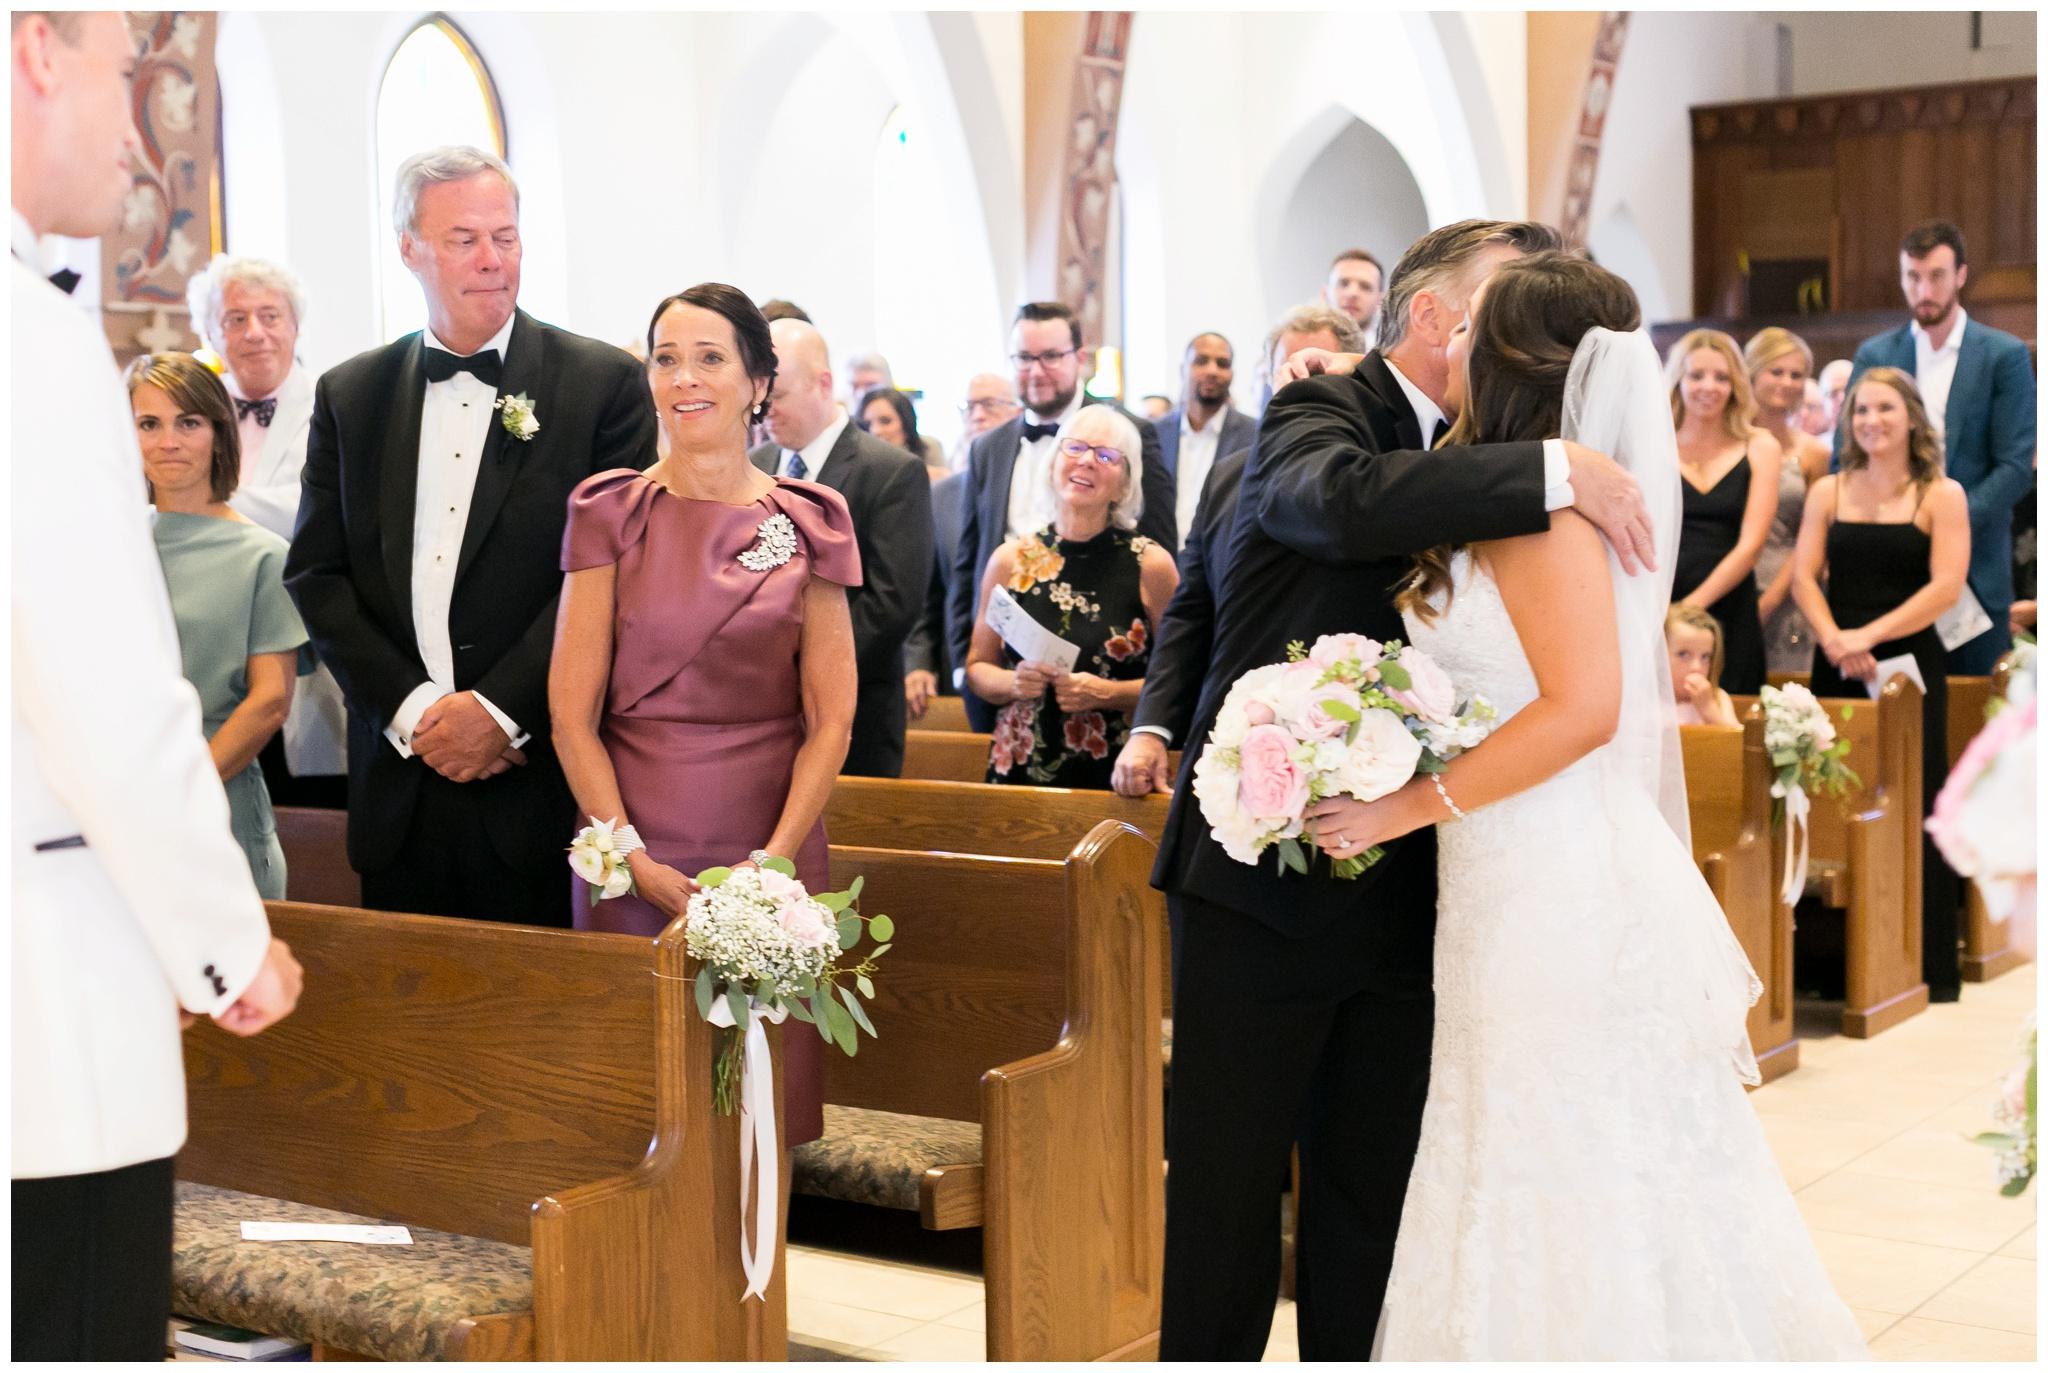 UW_Memorial_Union_wedding_madison_wisconsin_wedding_photographers_4609.jpg